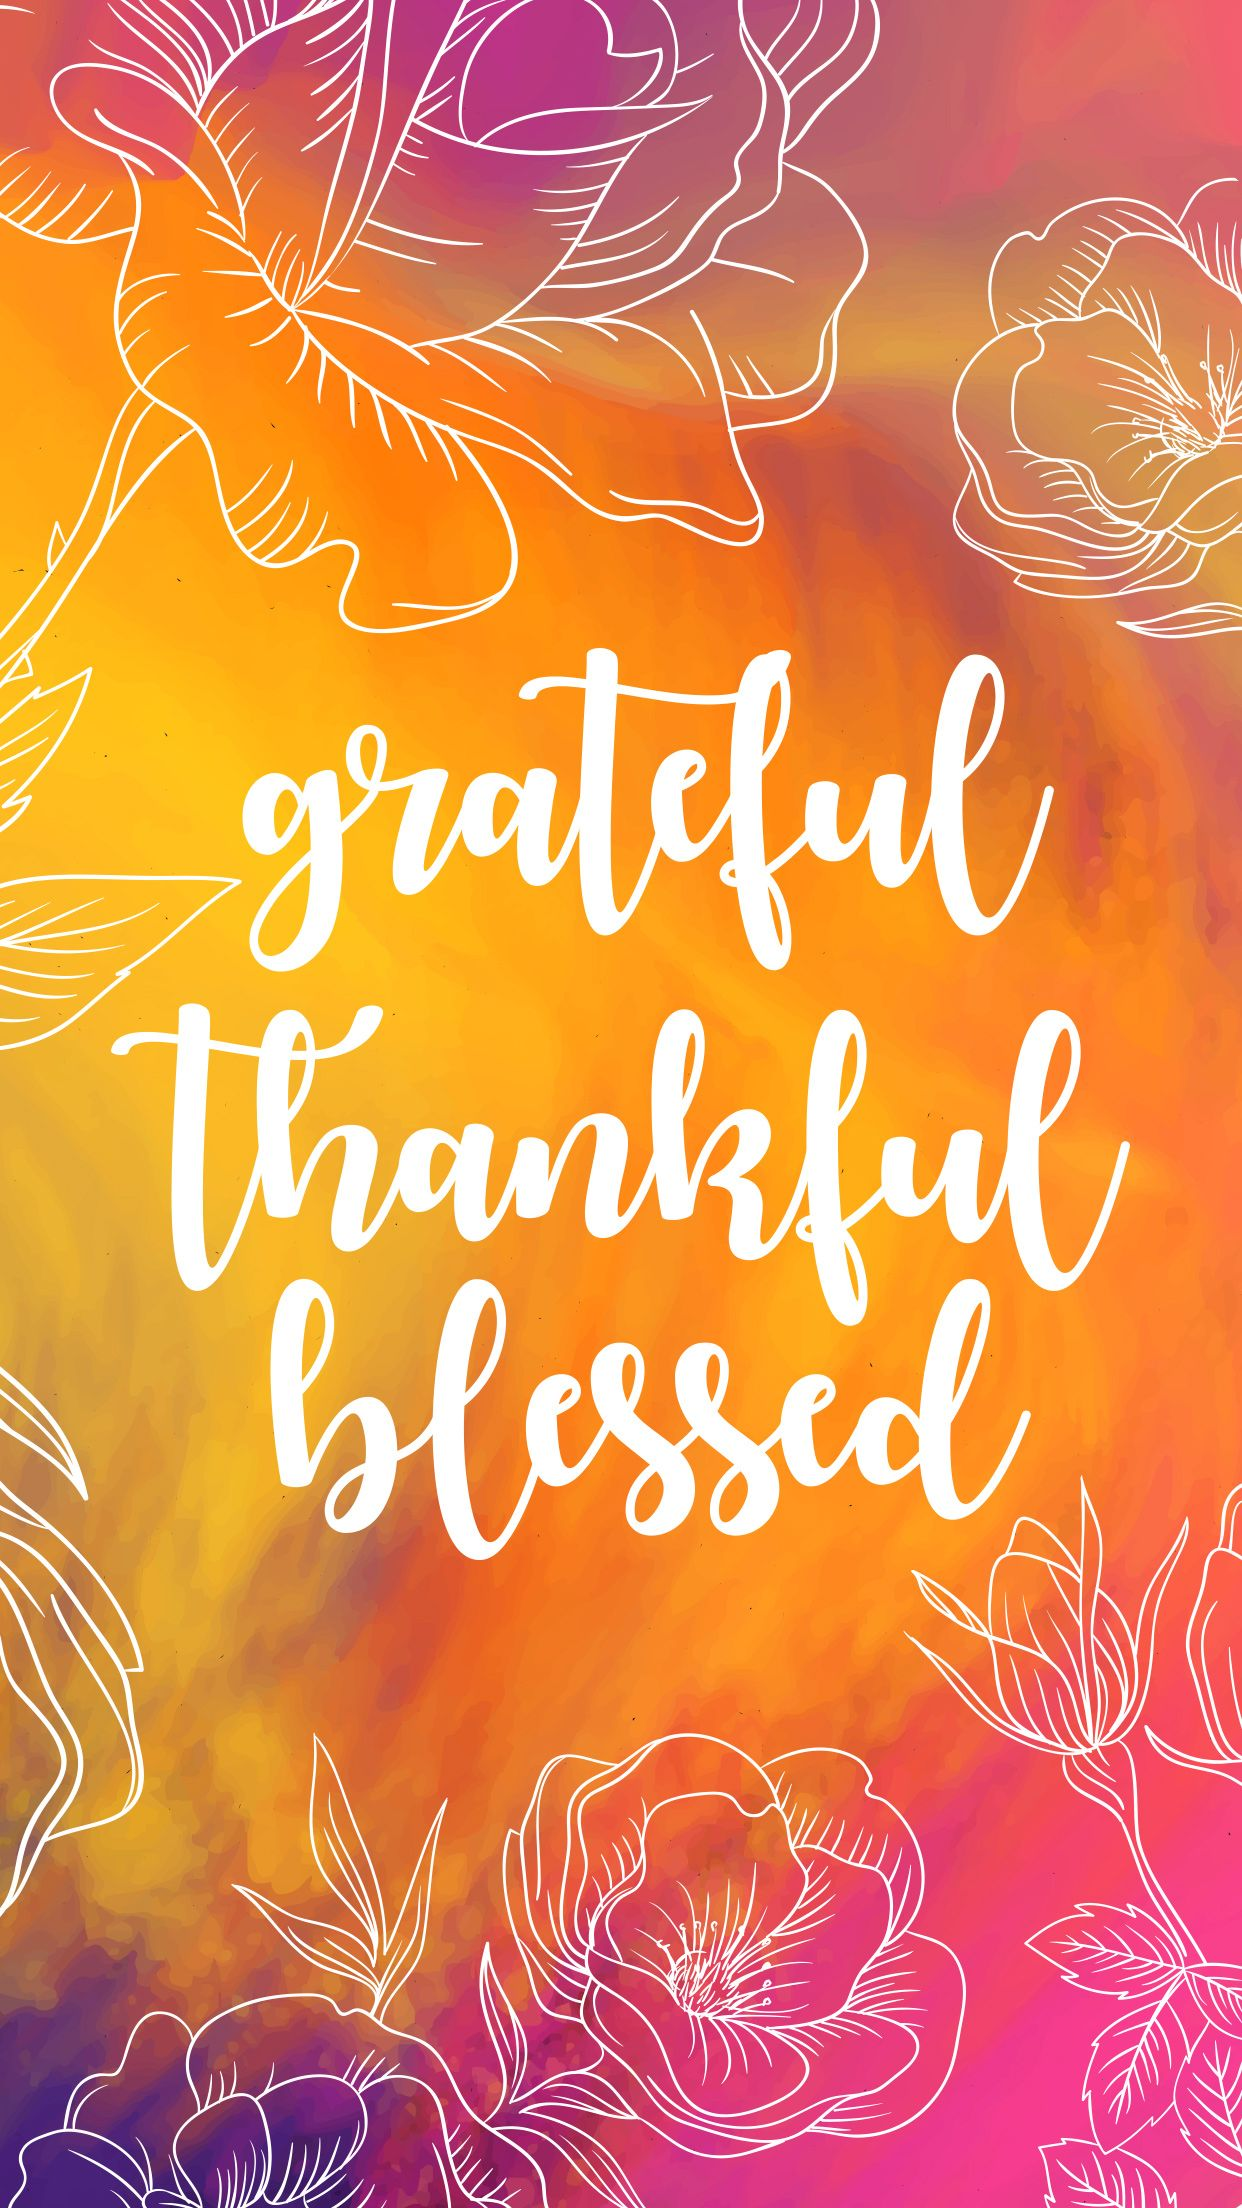 Phone Wallpaper Grateful Thankful Blessed On Your Phone Gratitude Wallpaper Phone 1242x2208 Download Hd Wallpaper Wallpapertip